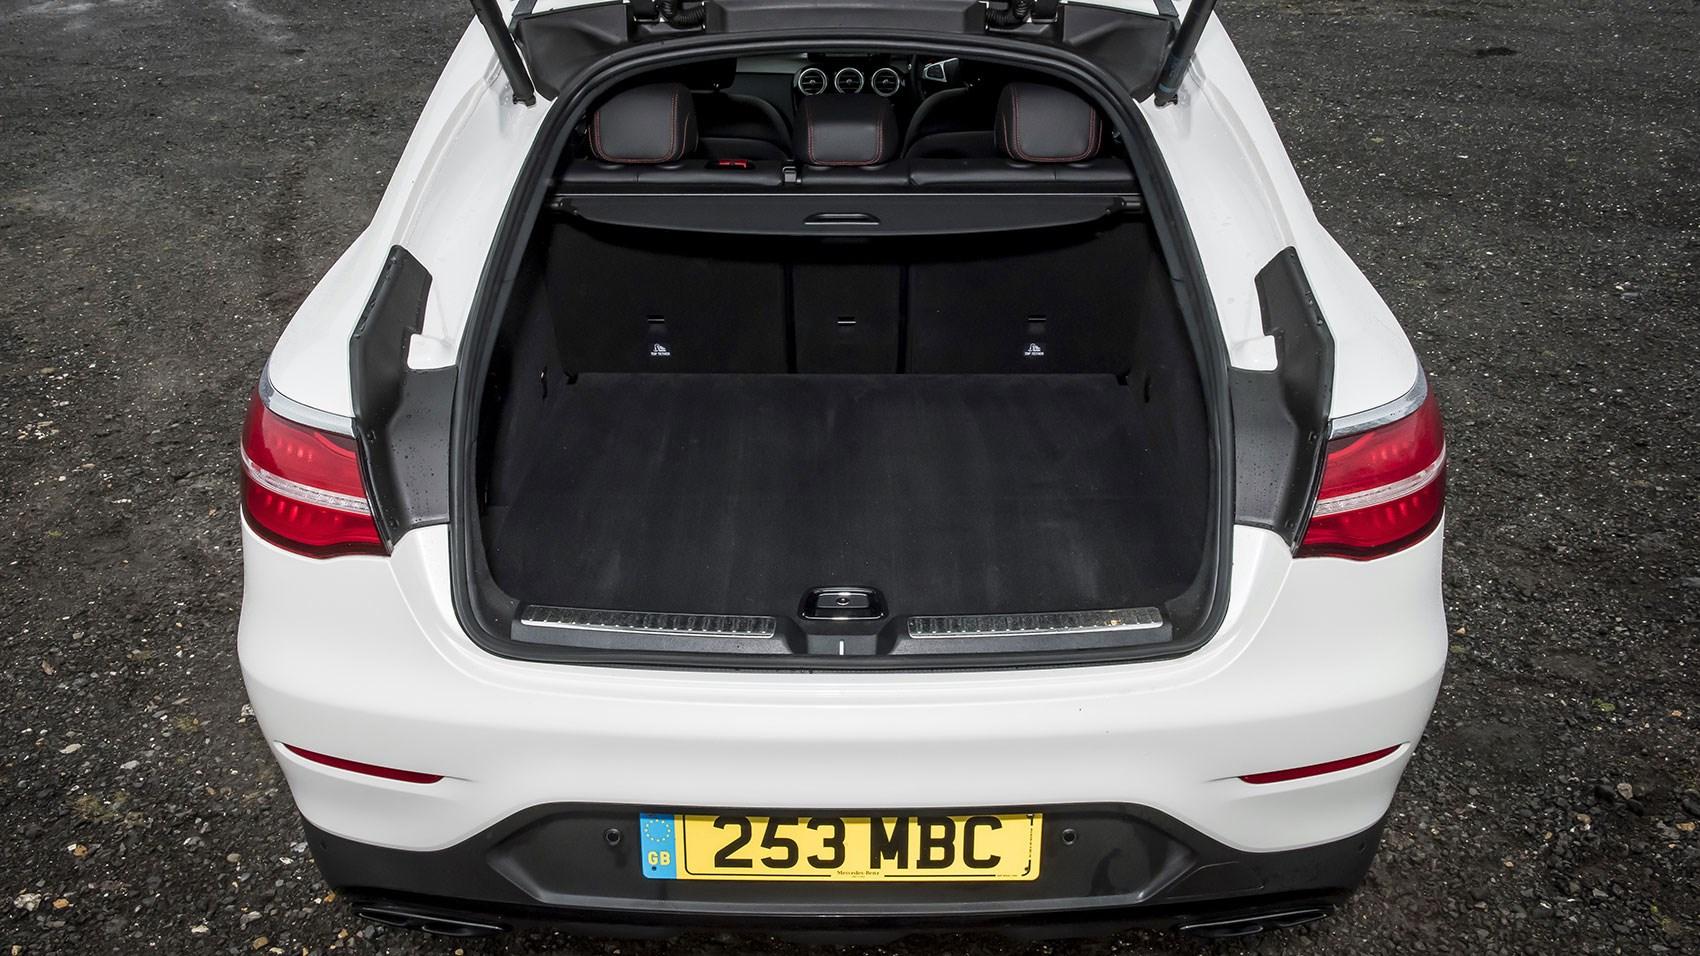 Mercedes Amg Glc43 4matic Coupe 2017